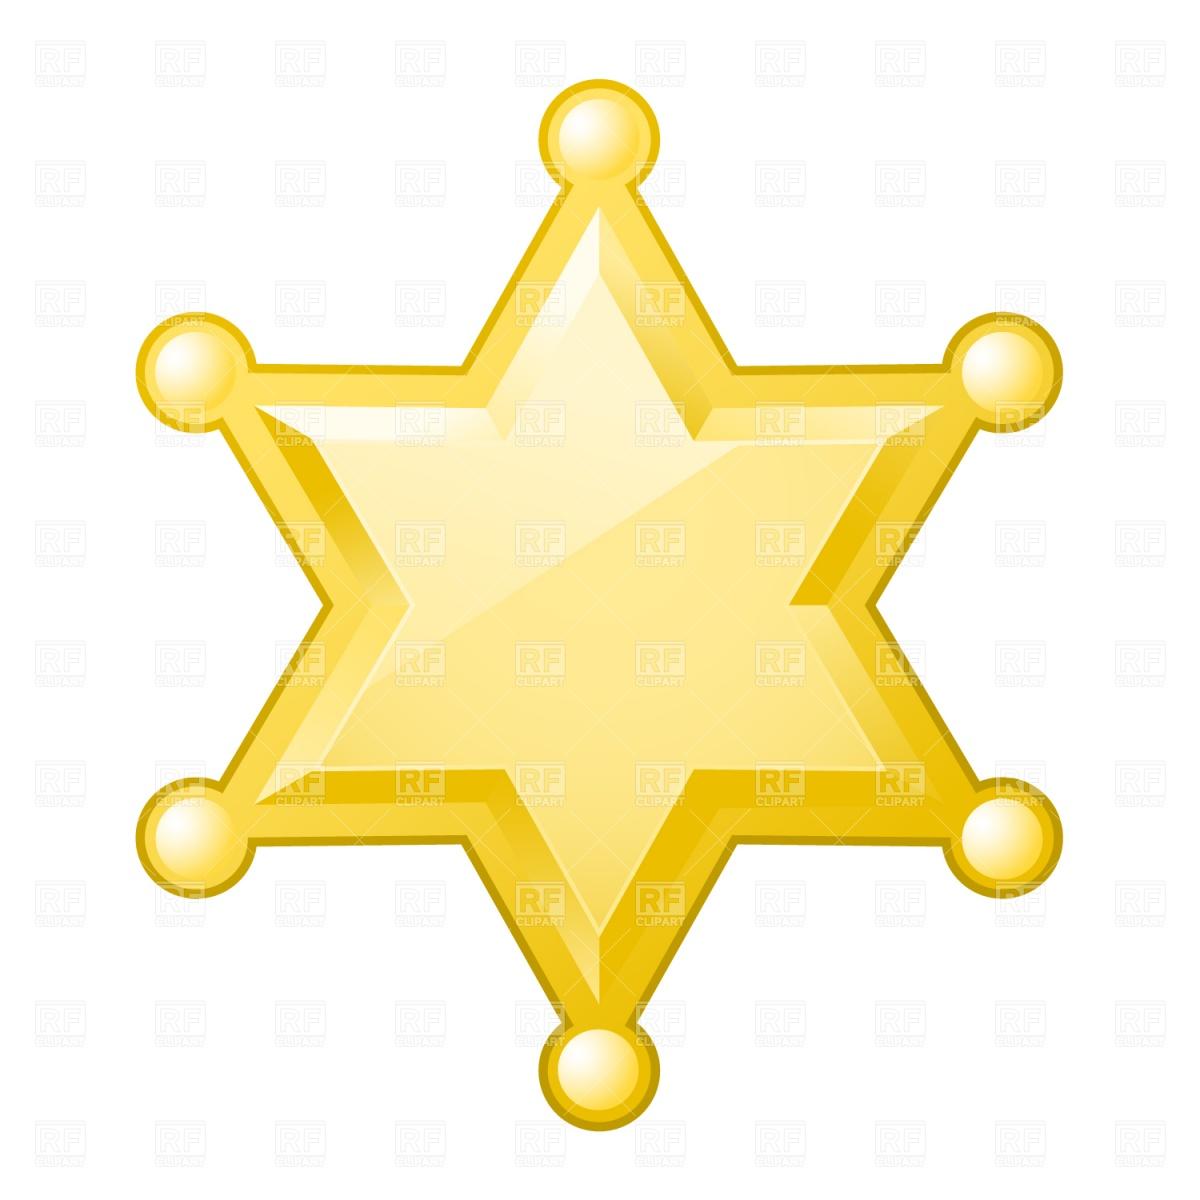 Clip Art Sheriff Badge Clipart sheriff badge clipart kid download royalty free vector eps